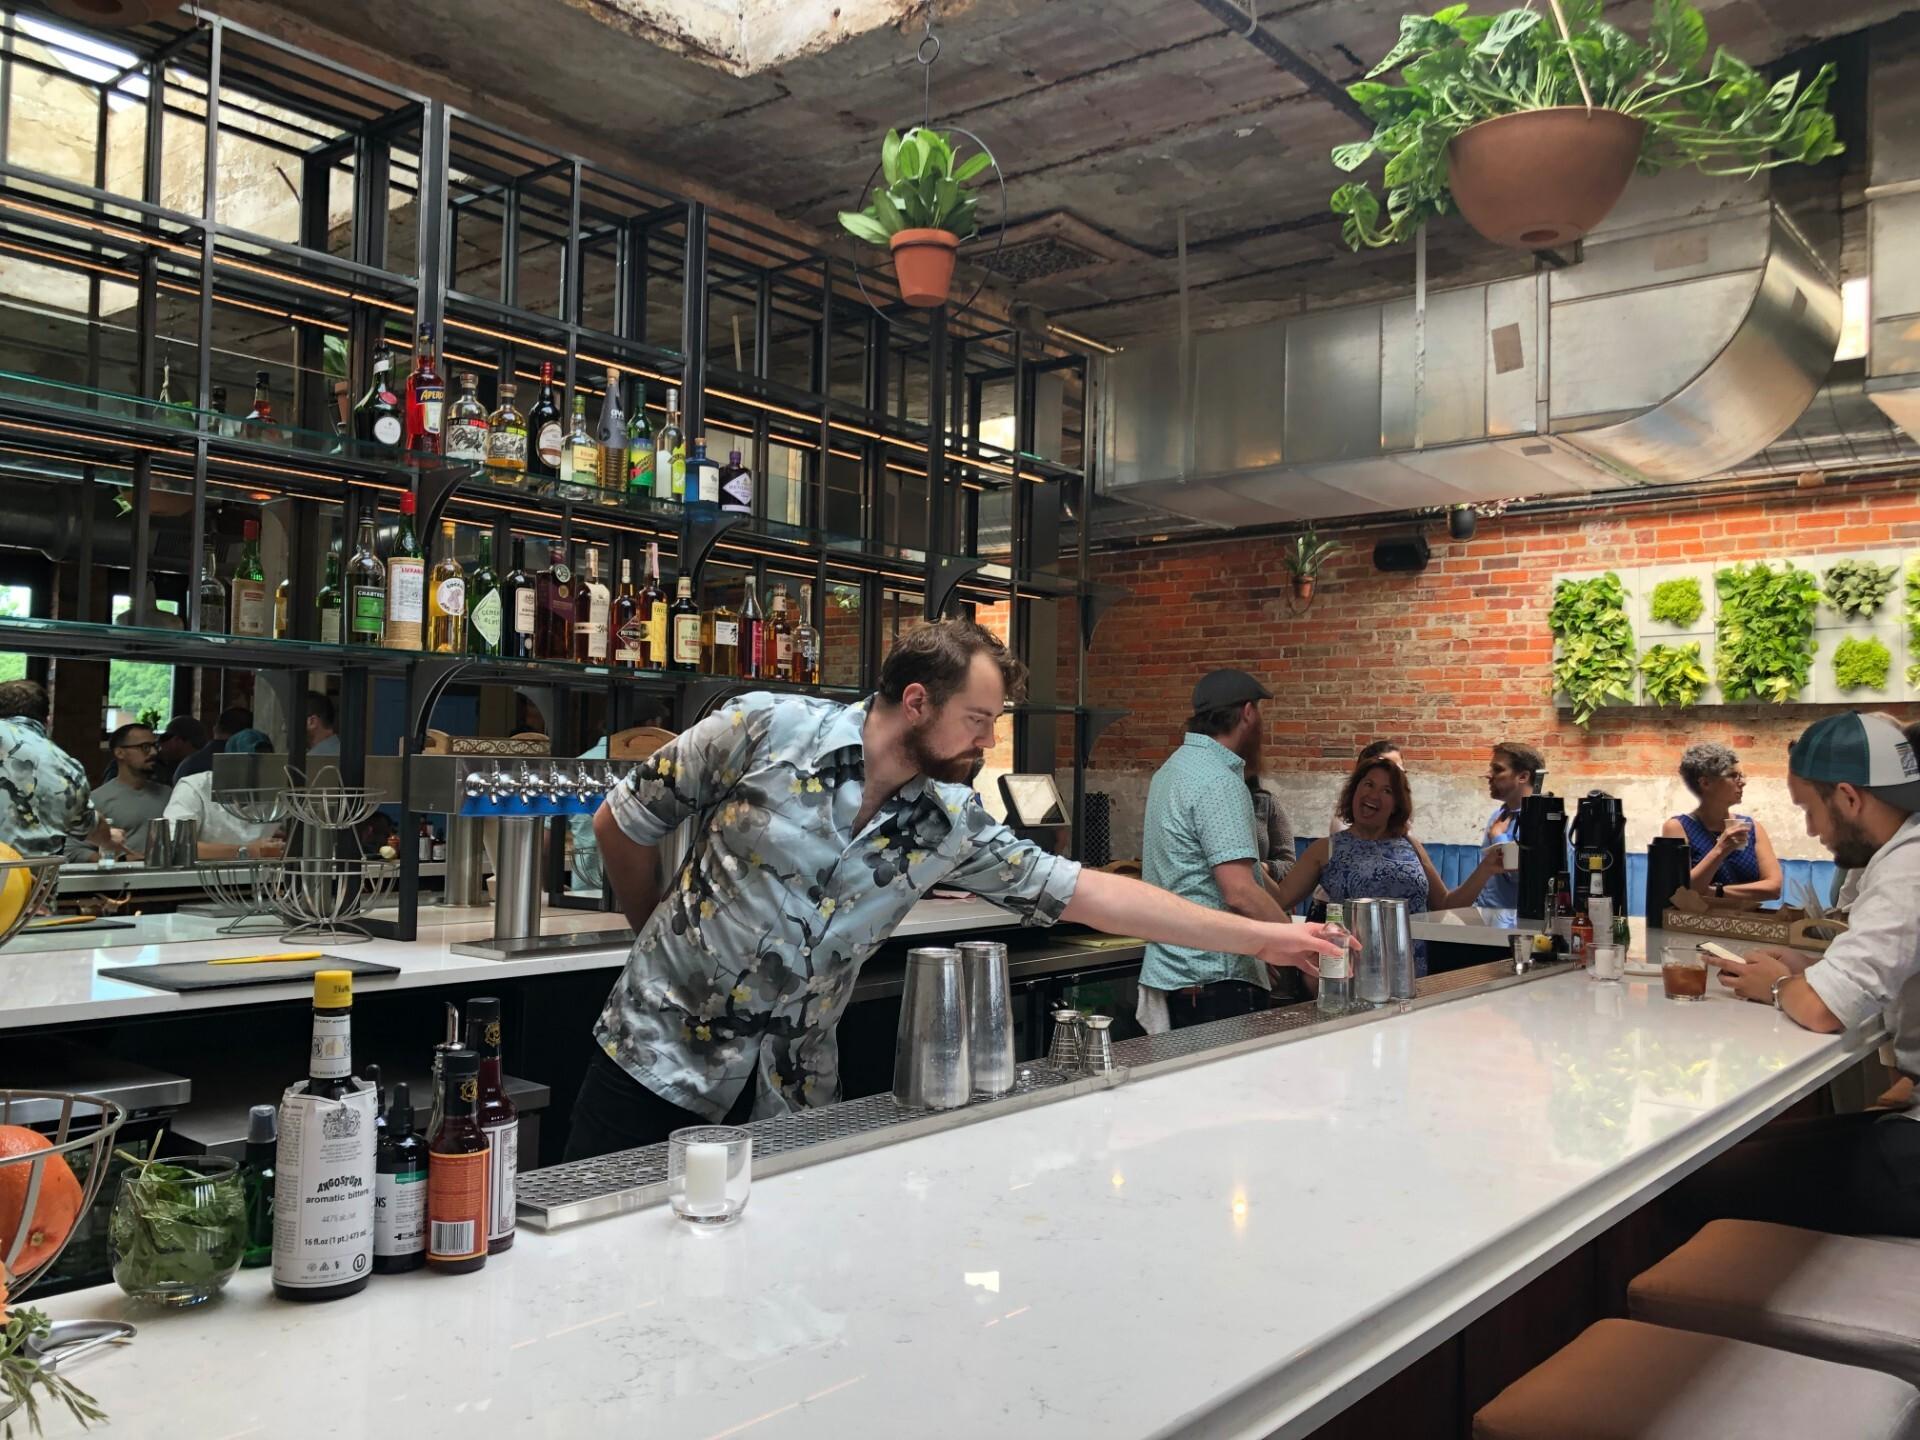 Comfort_Station_bartender.jpg